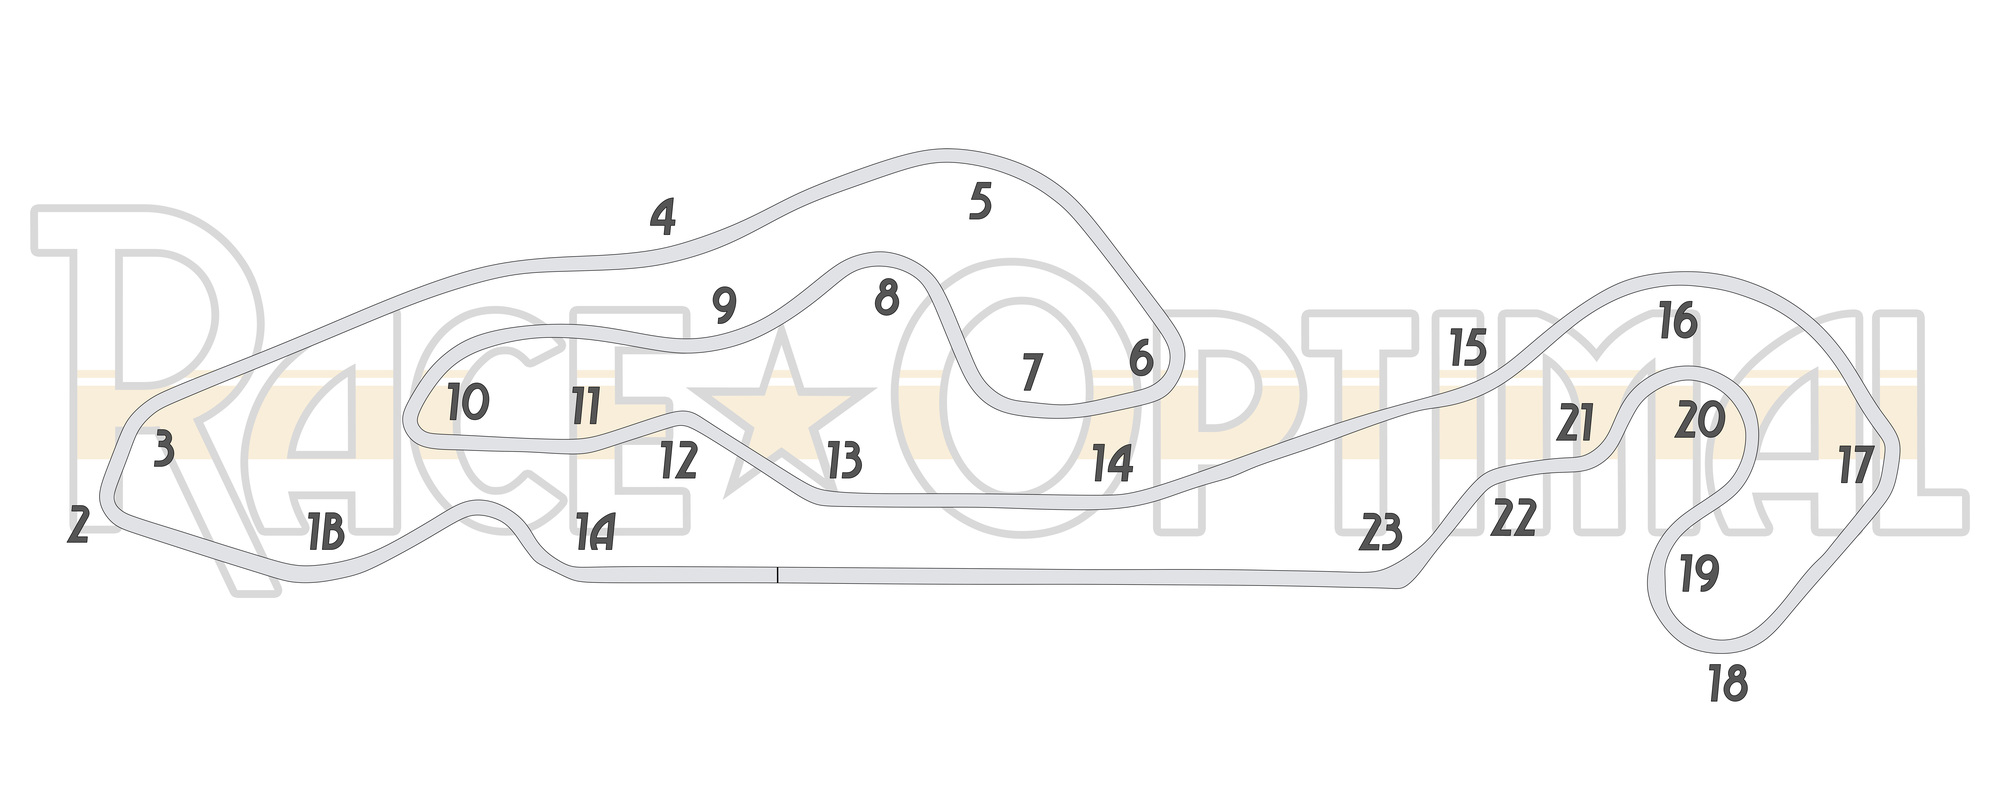 hight resolution of scion tc harness bar furthermore 2005 scion xa suspension diagram html also 2006